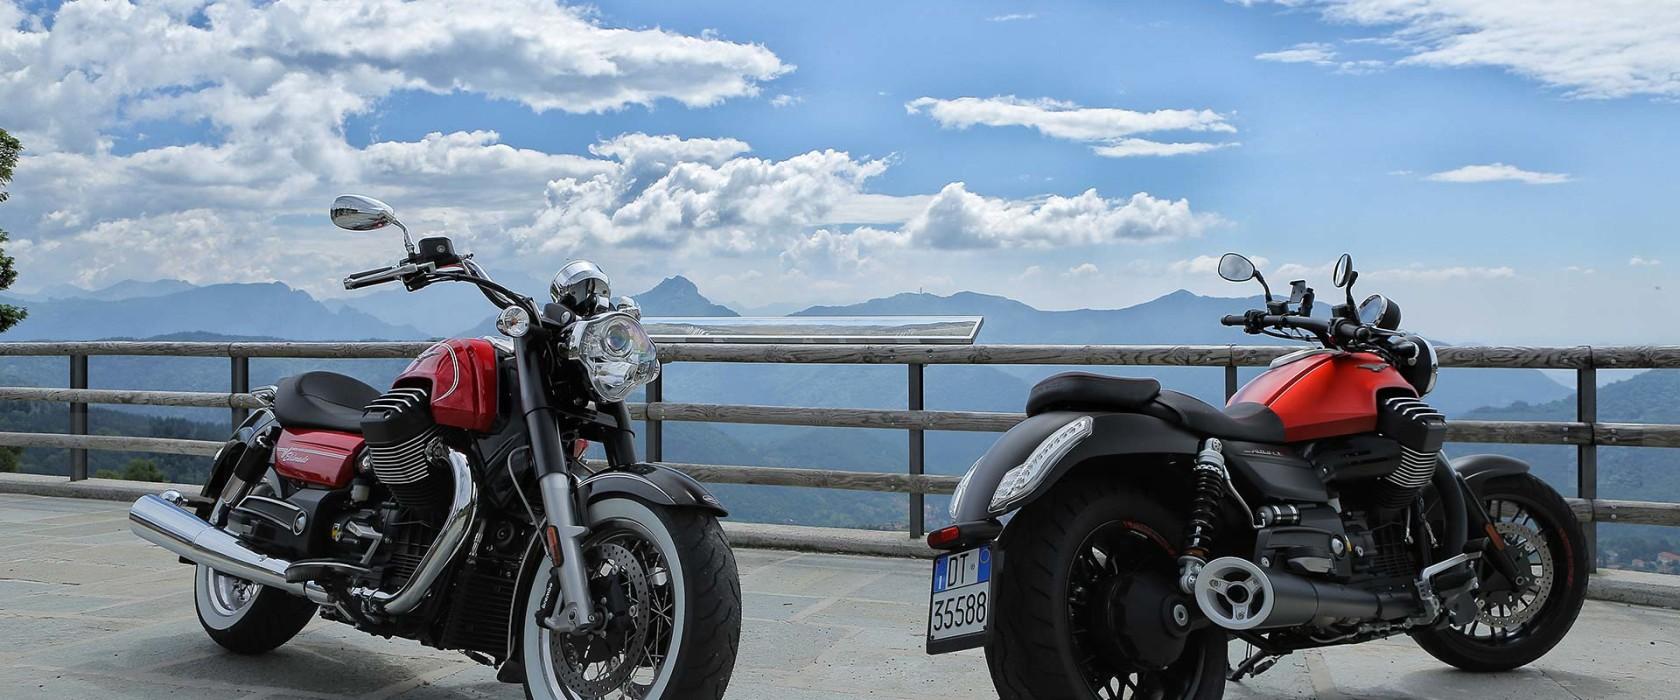 Prova Moto Guzzi Audace e Eldorado